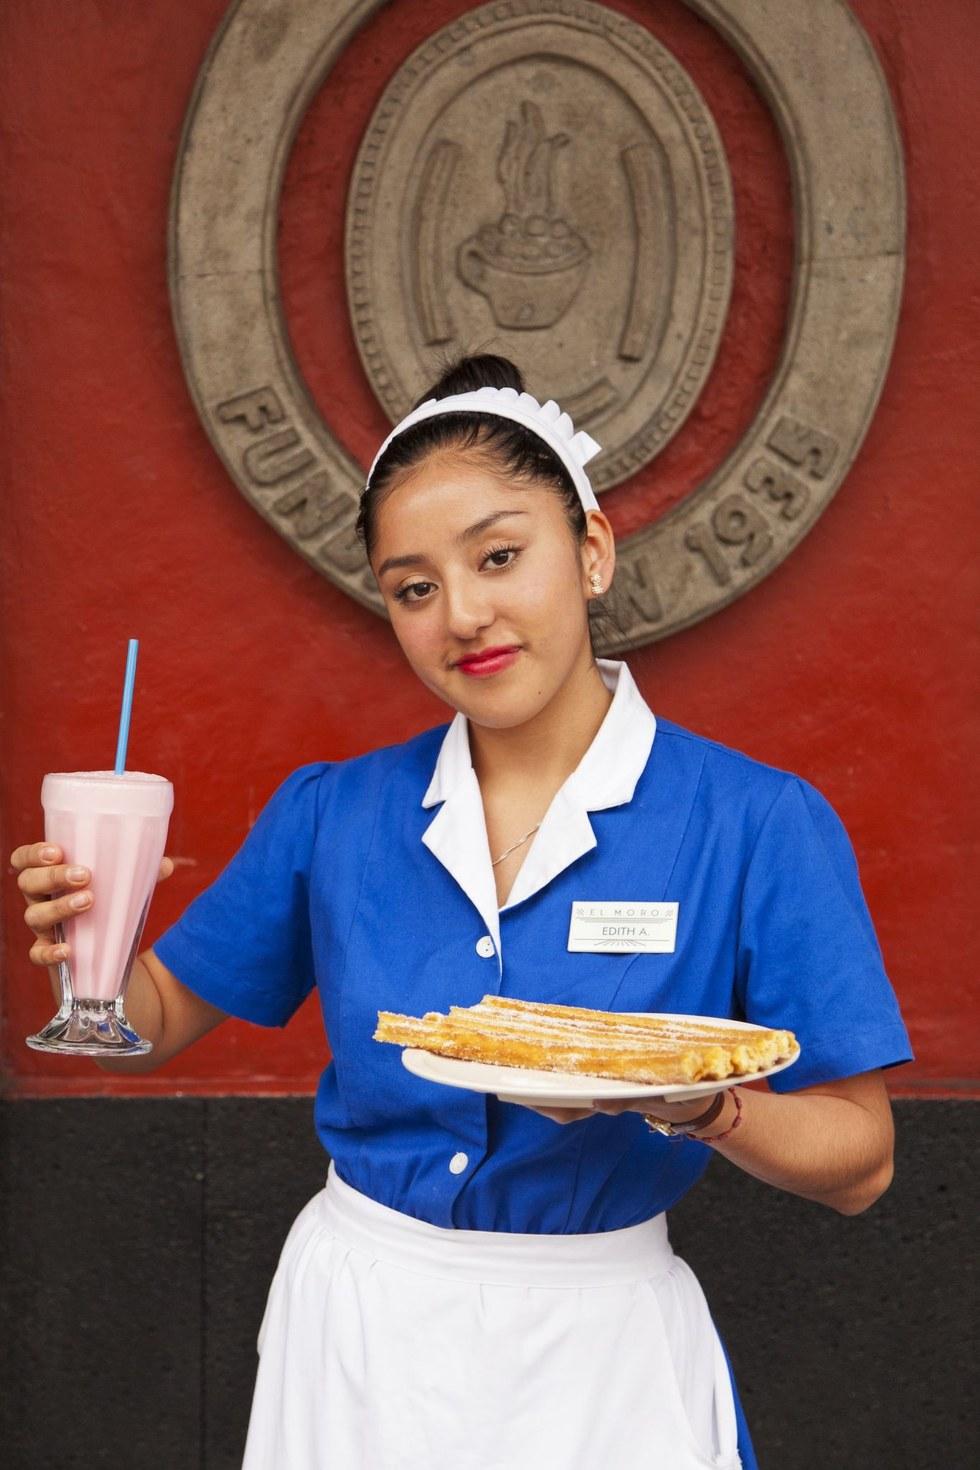 A waitress at Churrería El Moro